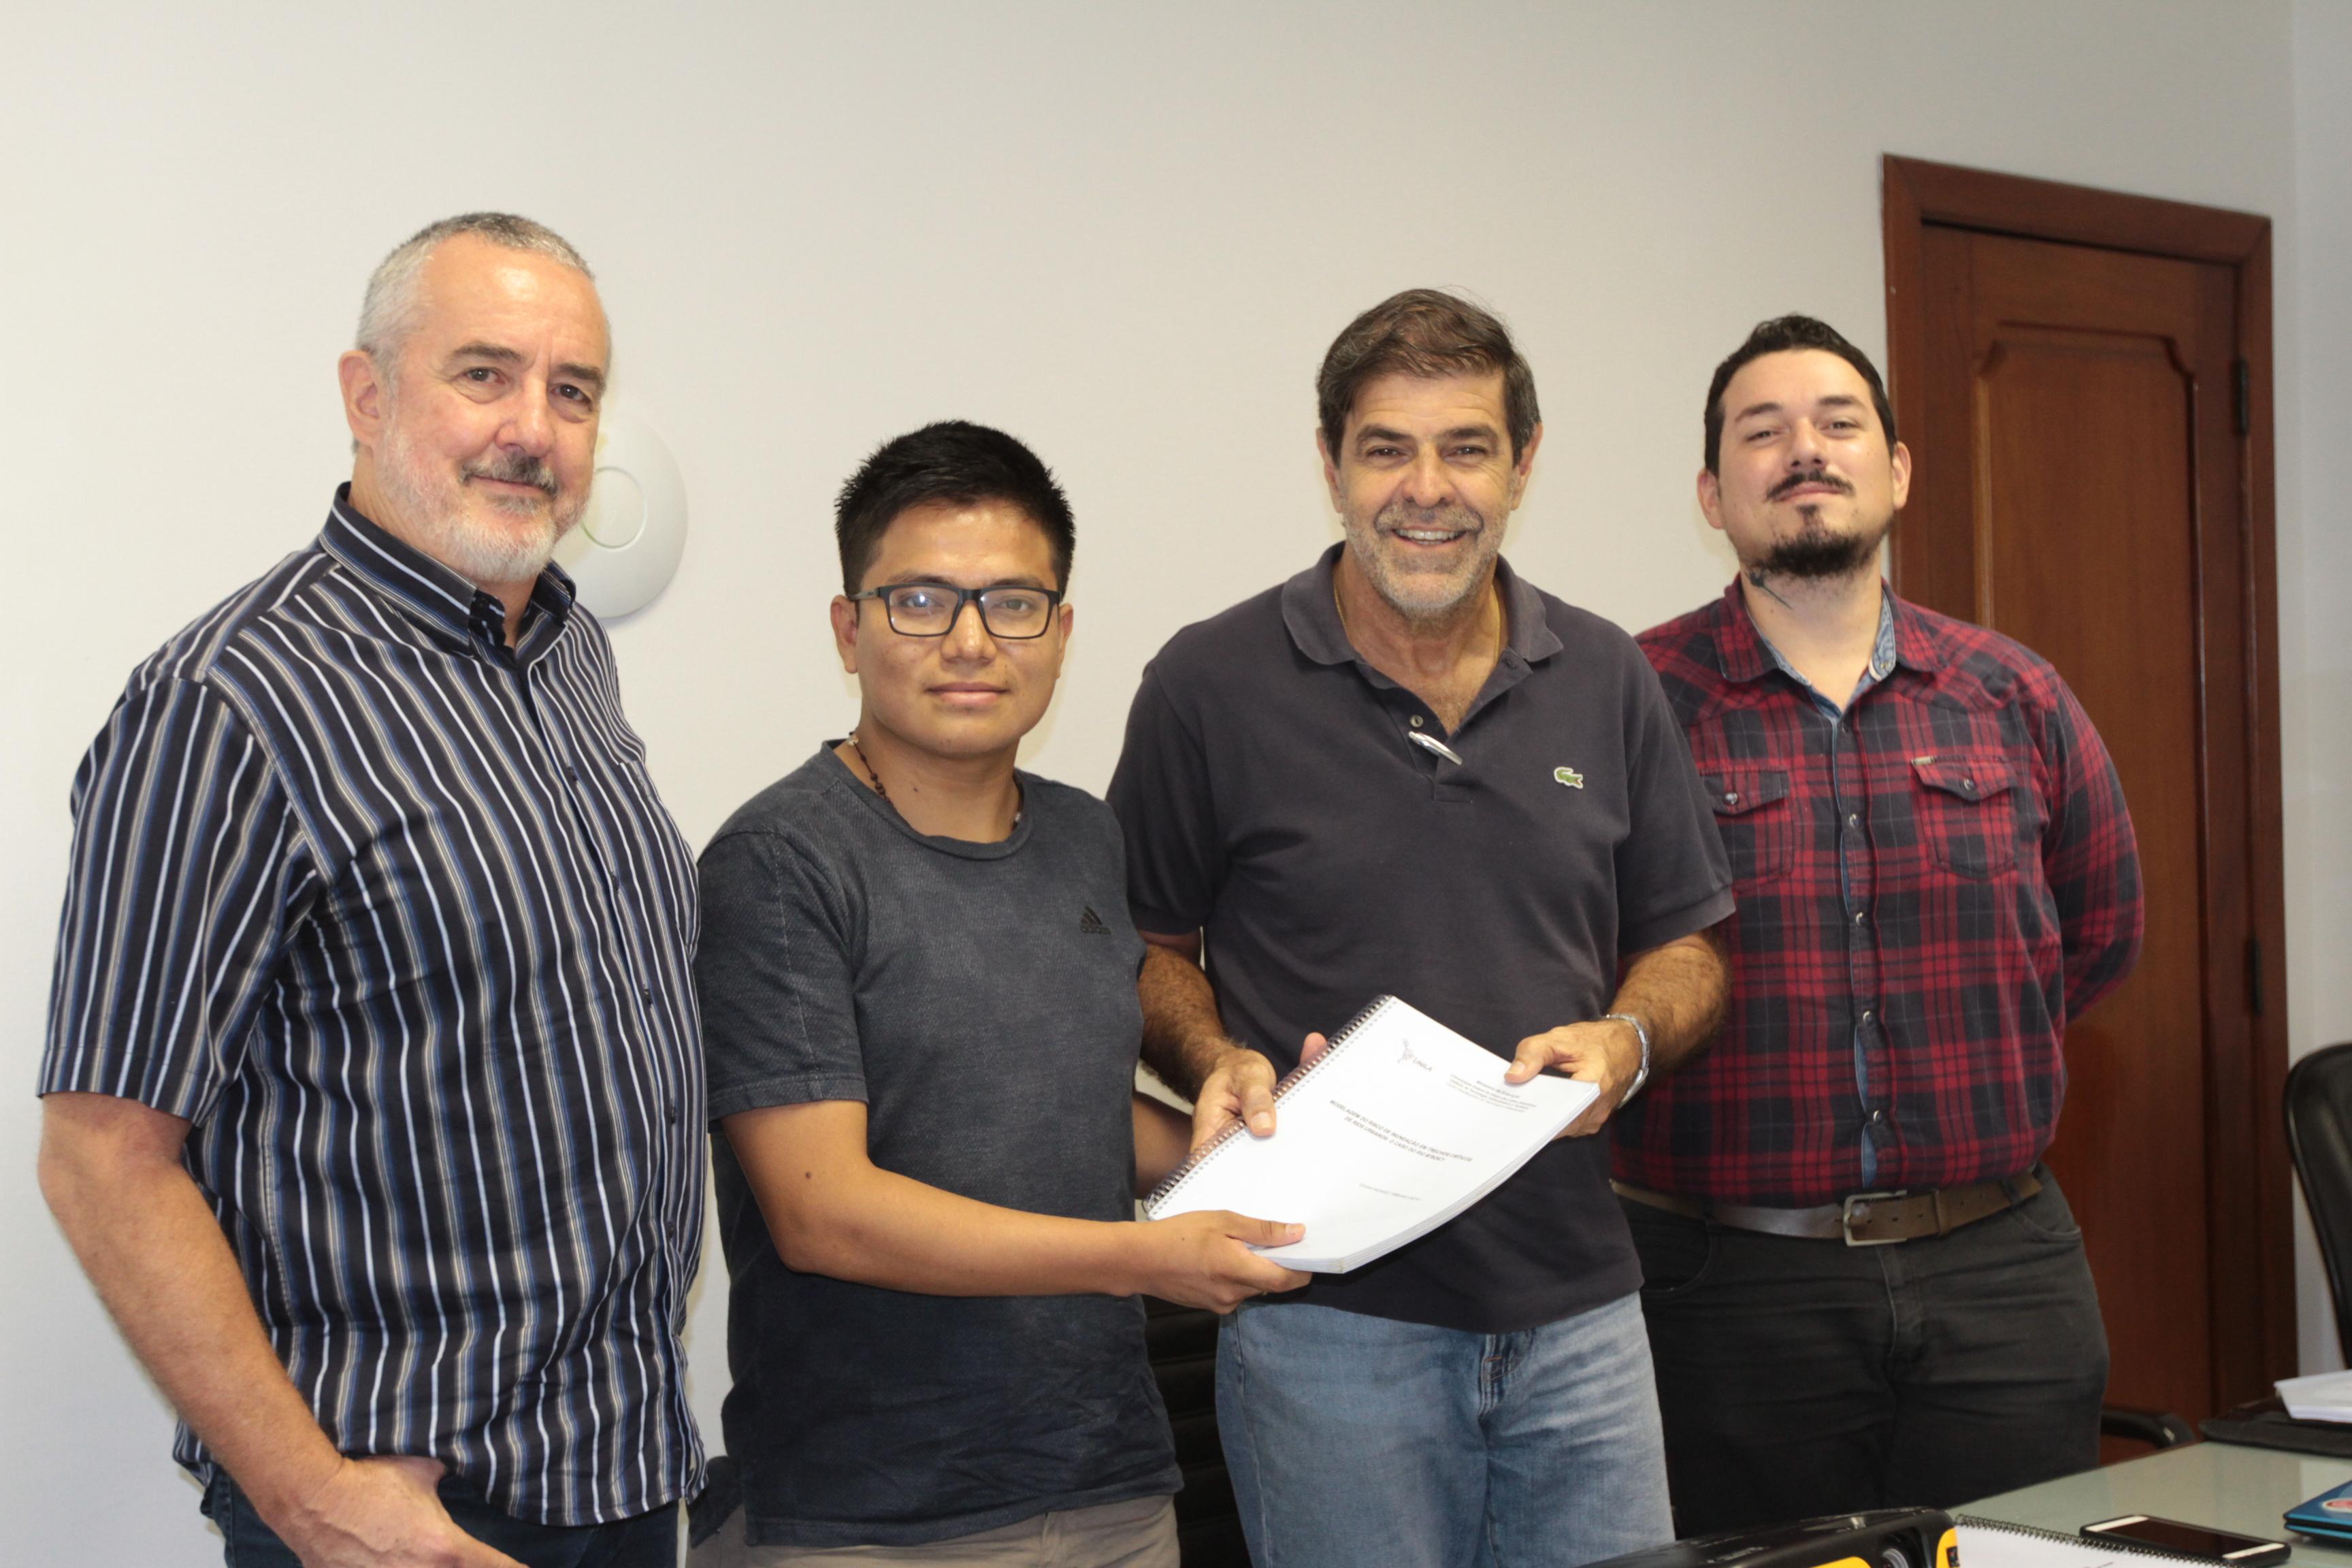 Glaucio Roloff, Edgar Jacho, Elsidio Cavalcanti e Ariel Boldrini